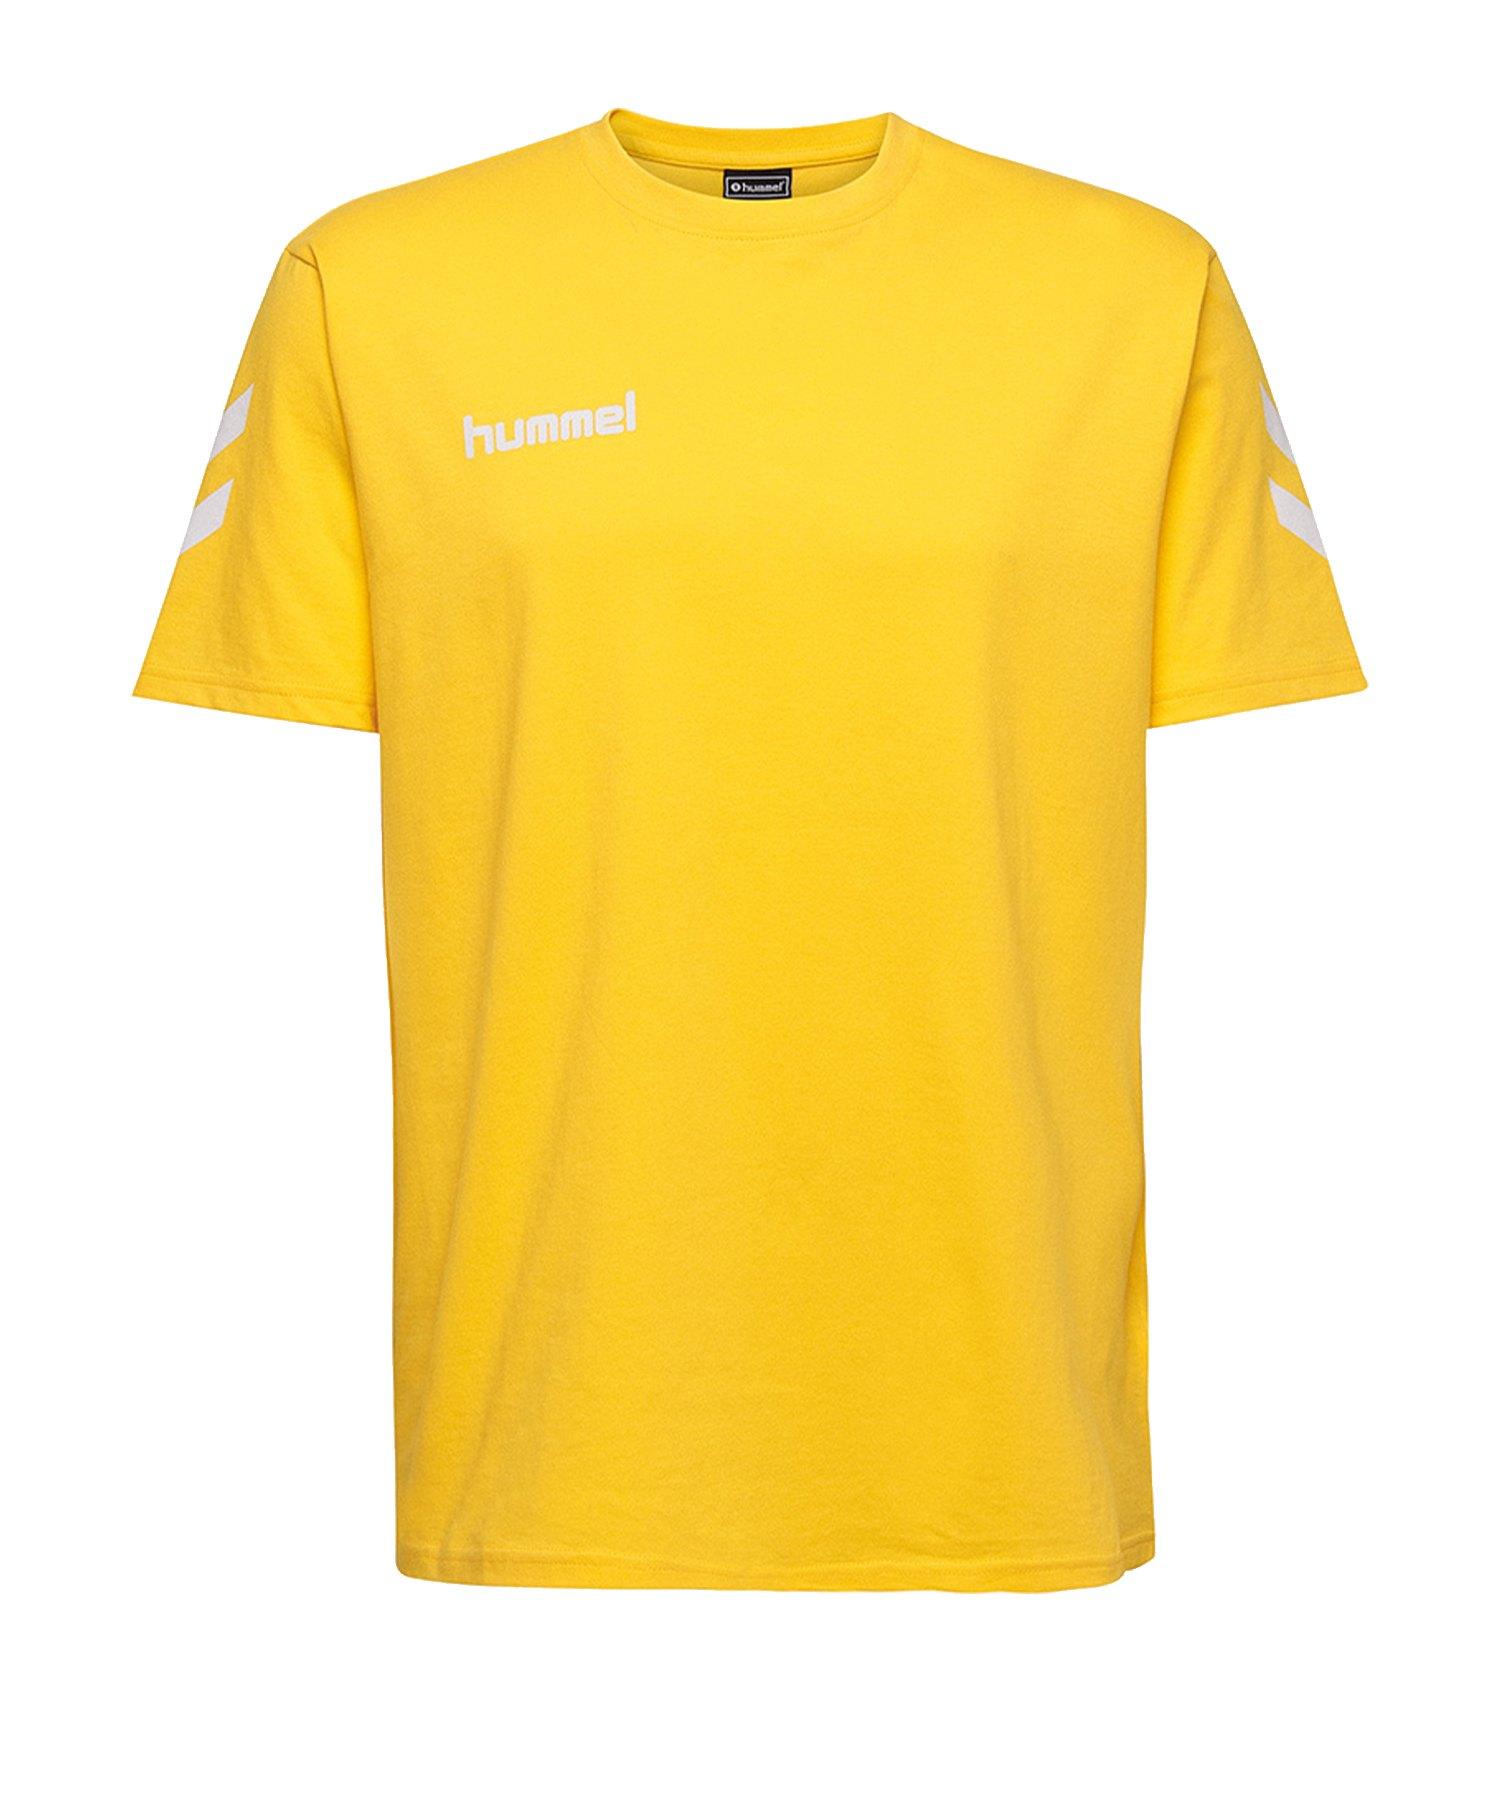 Hummel Cotton T-Shirt Kids Gelb F5001 - Gelb